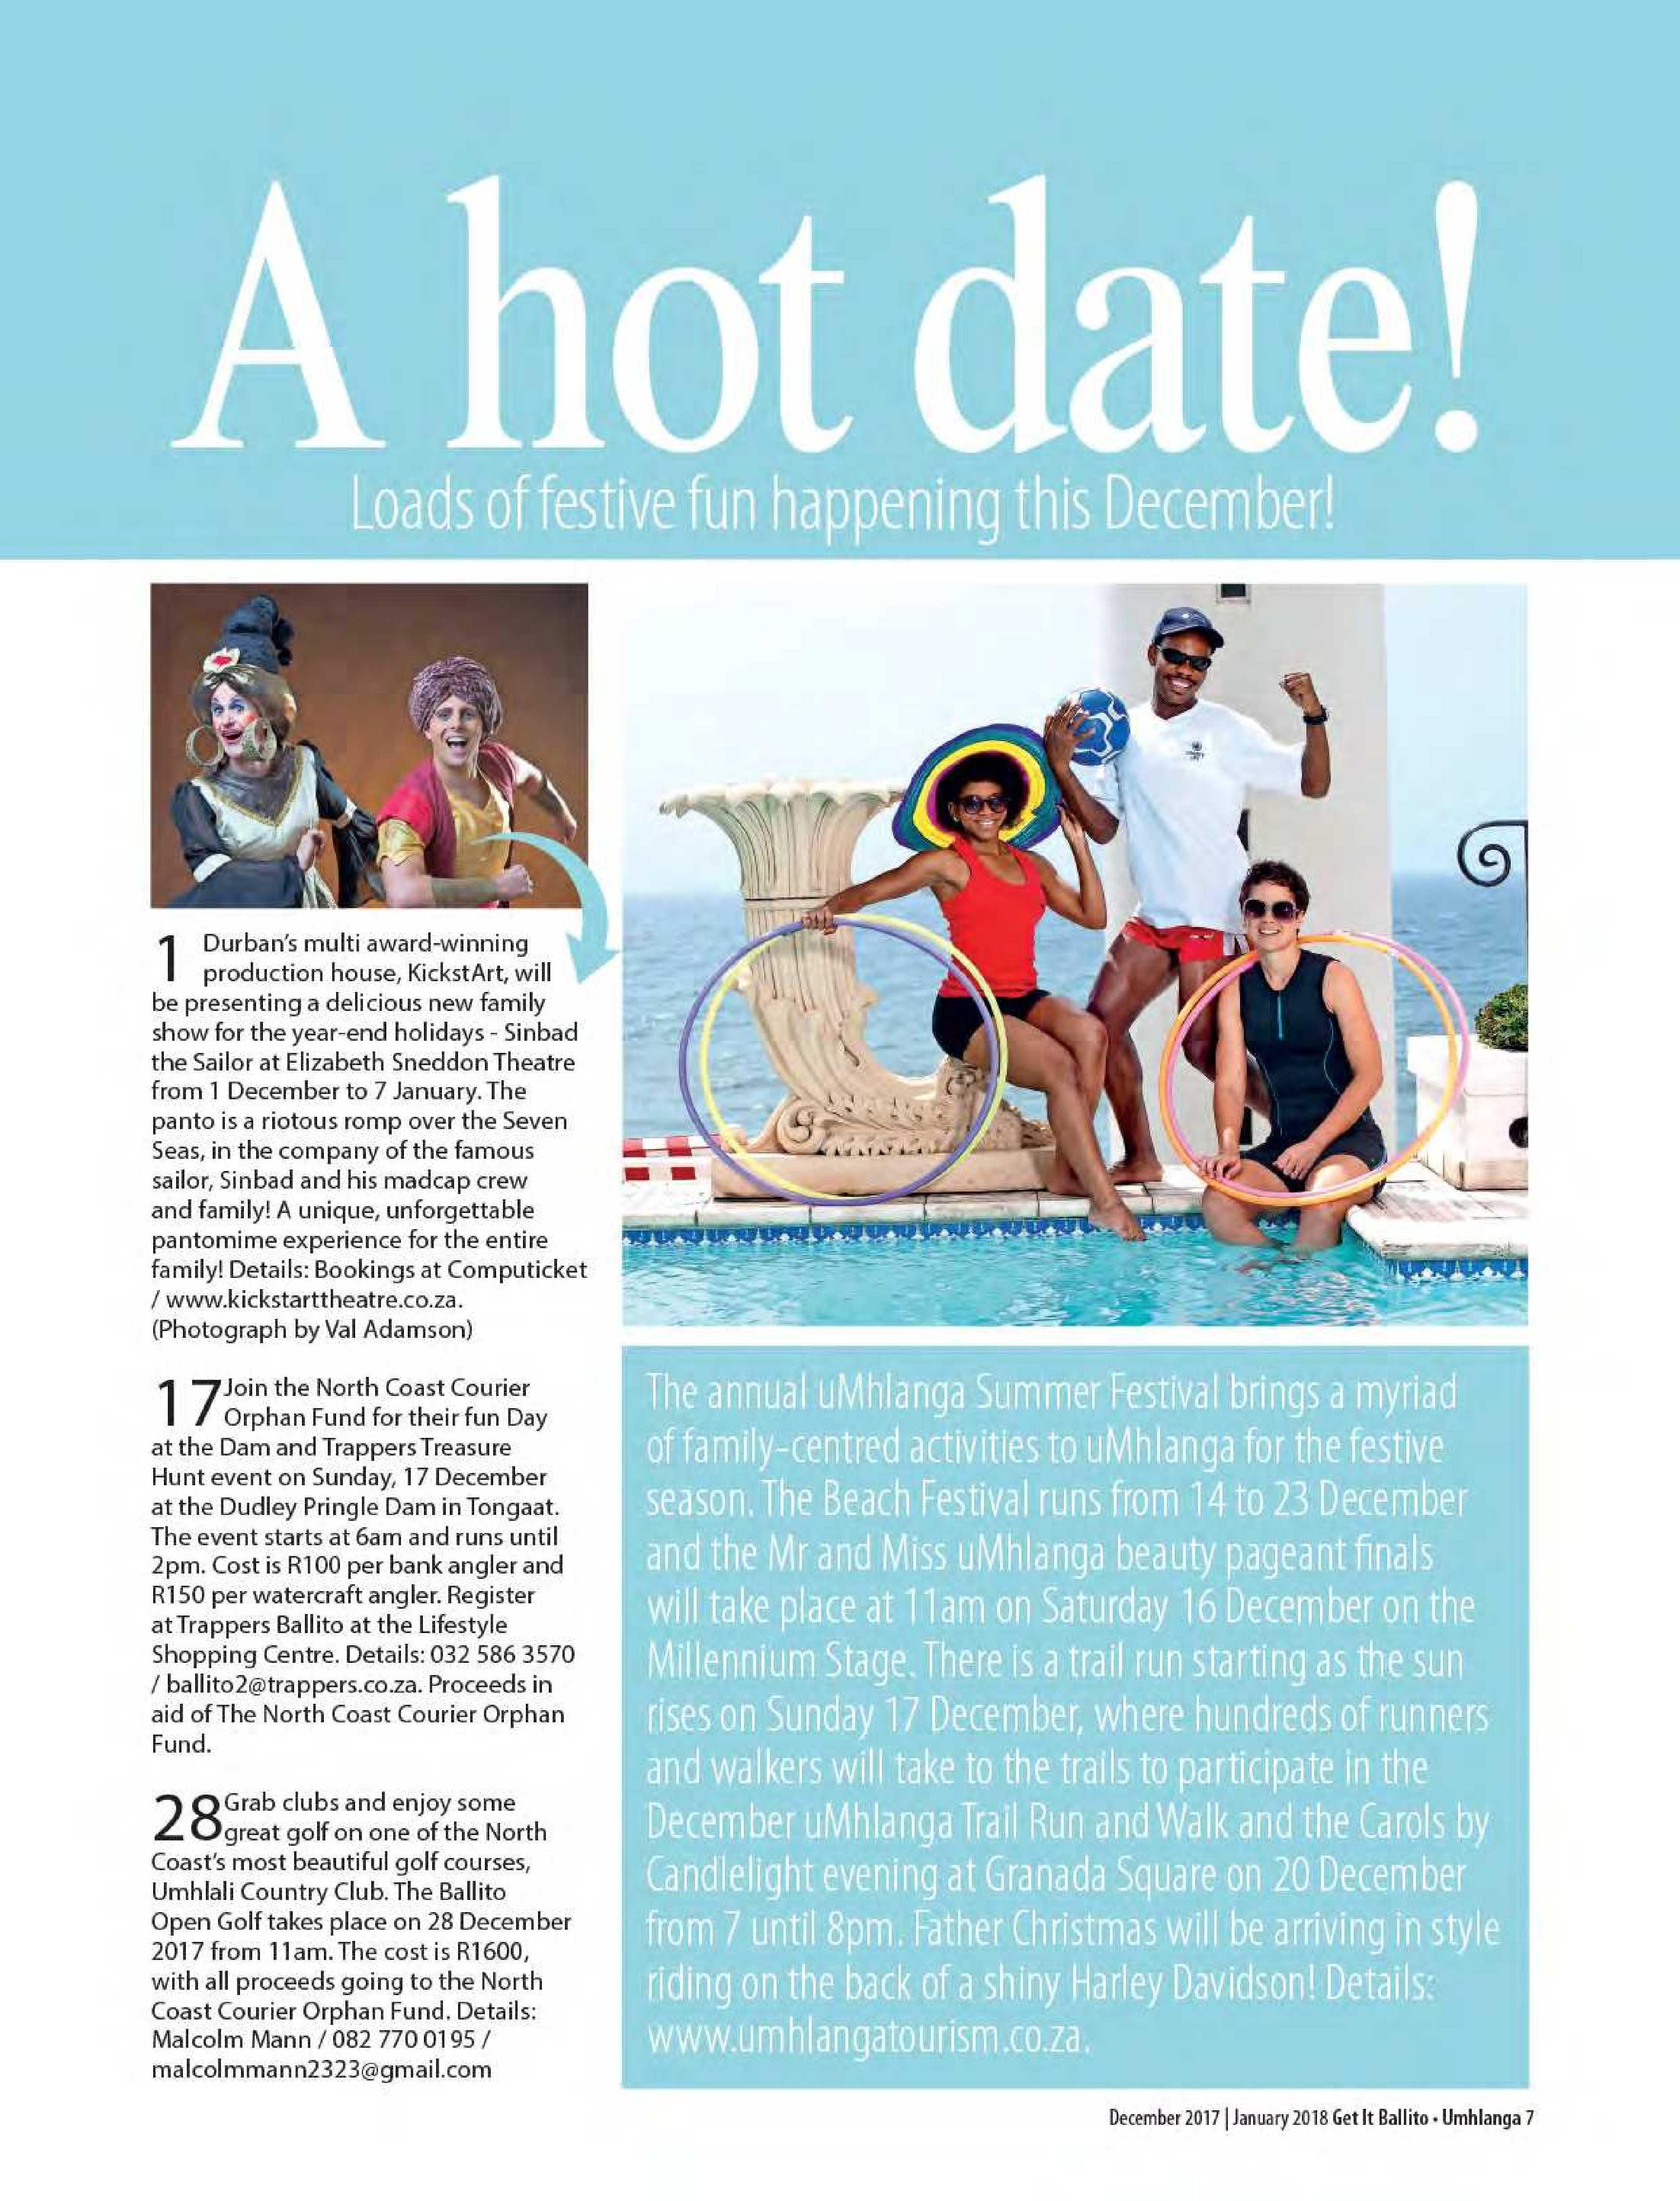 get-magazine-ballitoumhlanga-december-2017-january-2018-2-epapers-page-9